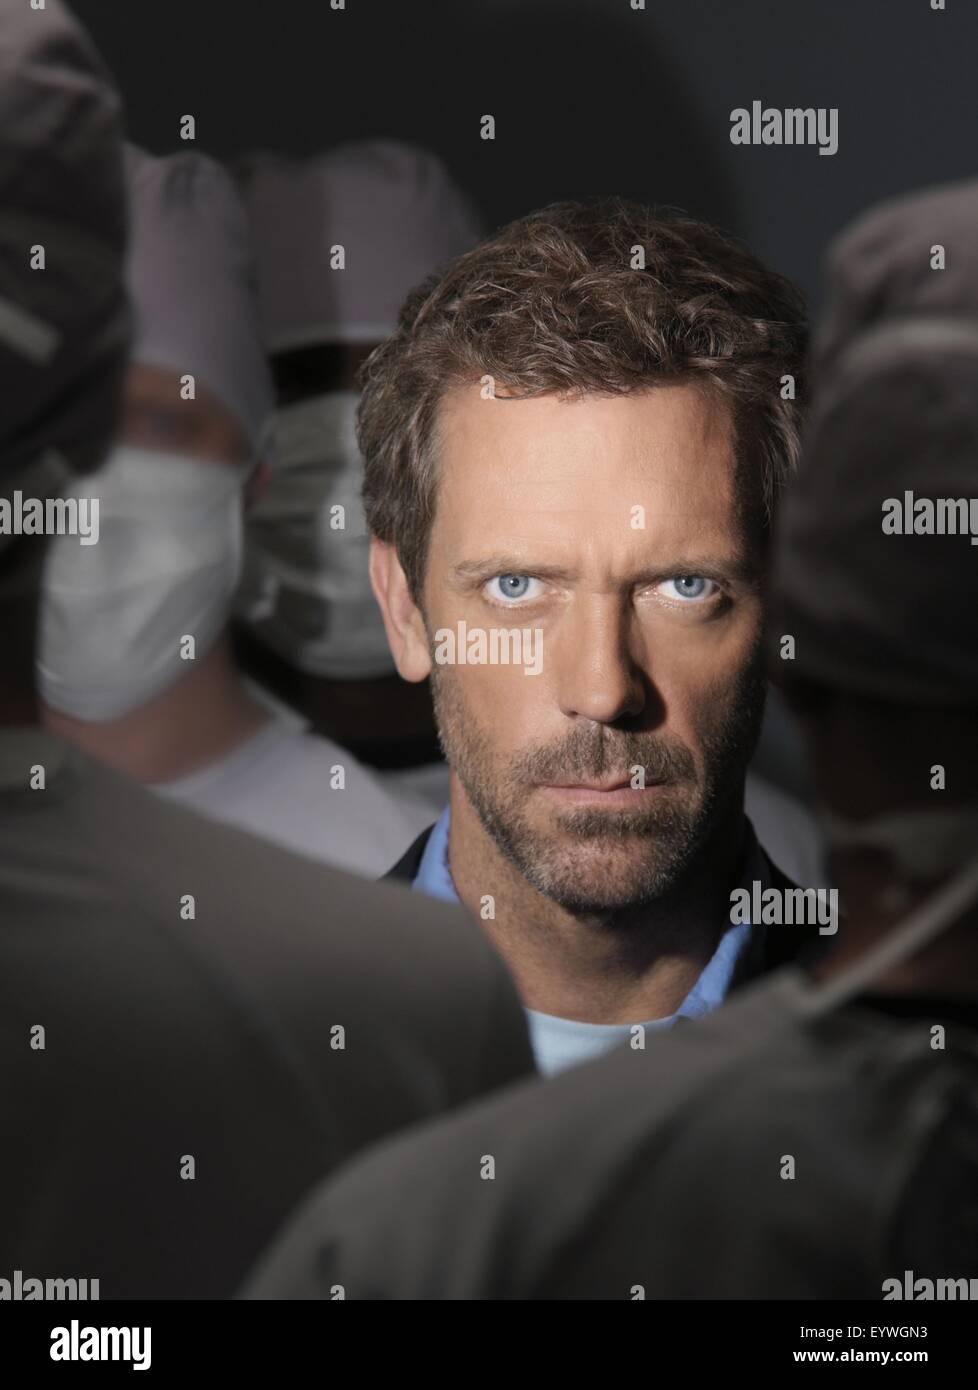 House M.D. ; TV Series 2004 - ???? USA ; 2006 Season 3 - promotion ; Hugh Laurie ; Photo: Andrew Macpherson / Fox - Stock Image